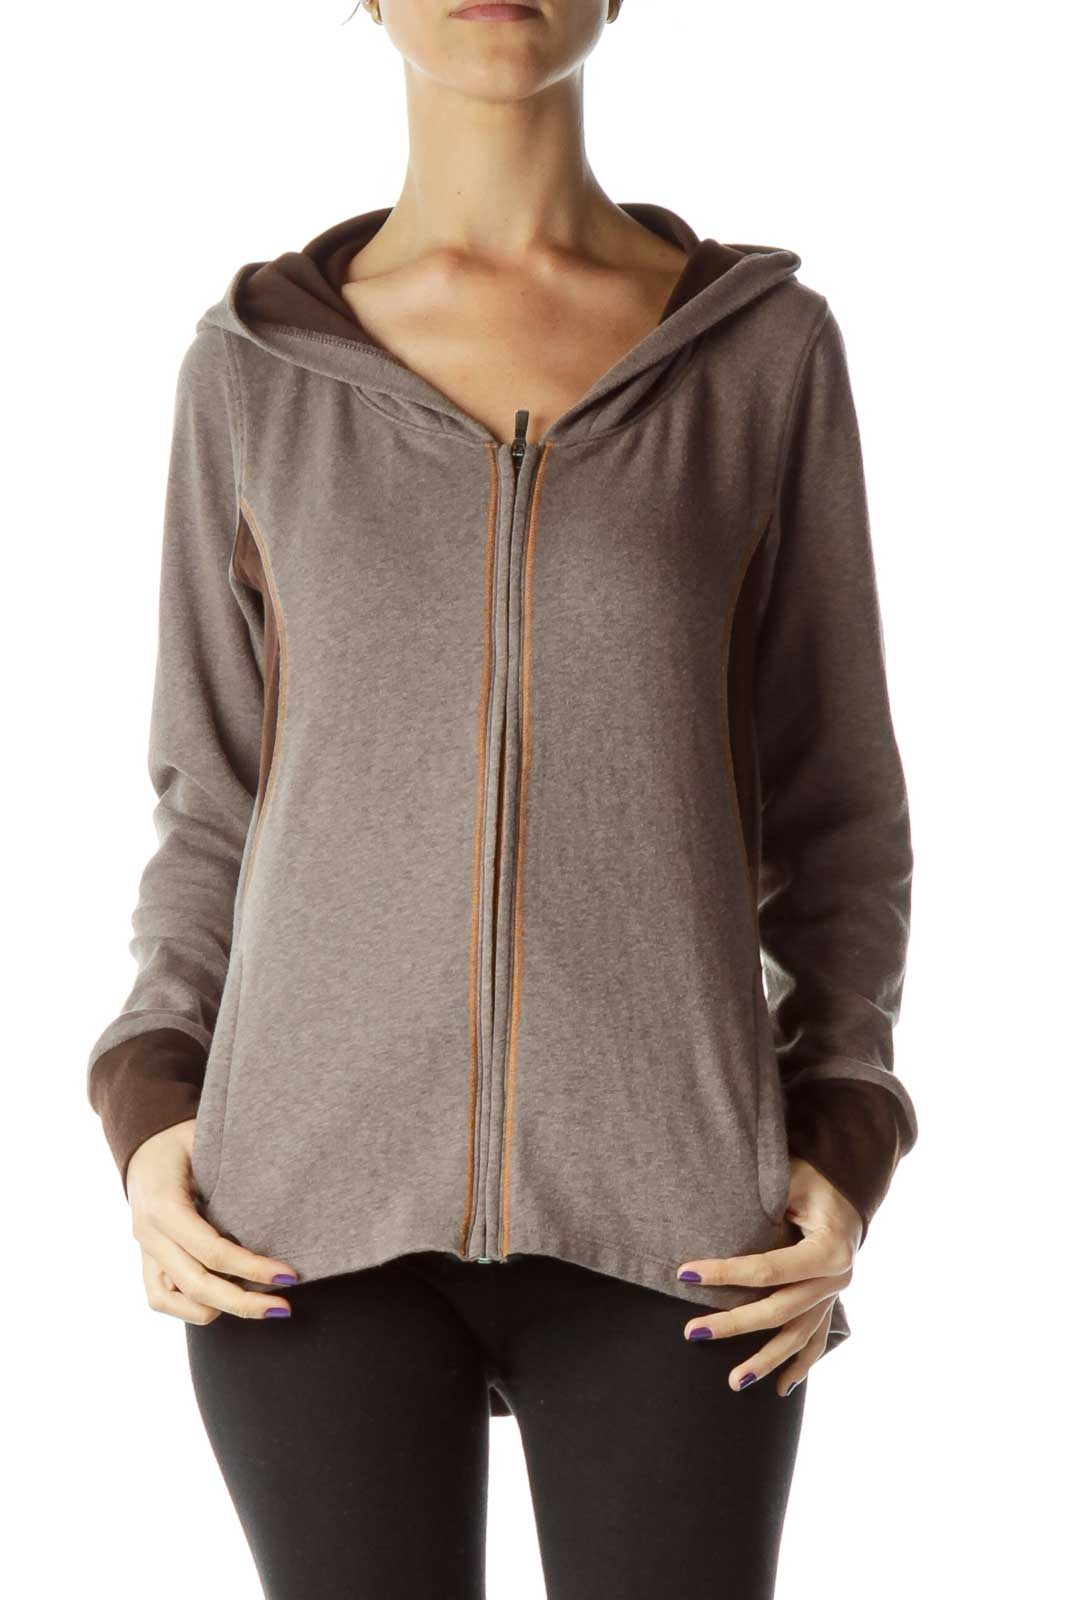 Brown Hooded Zip Up Jacket Front